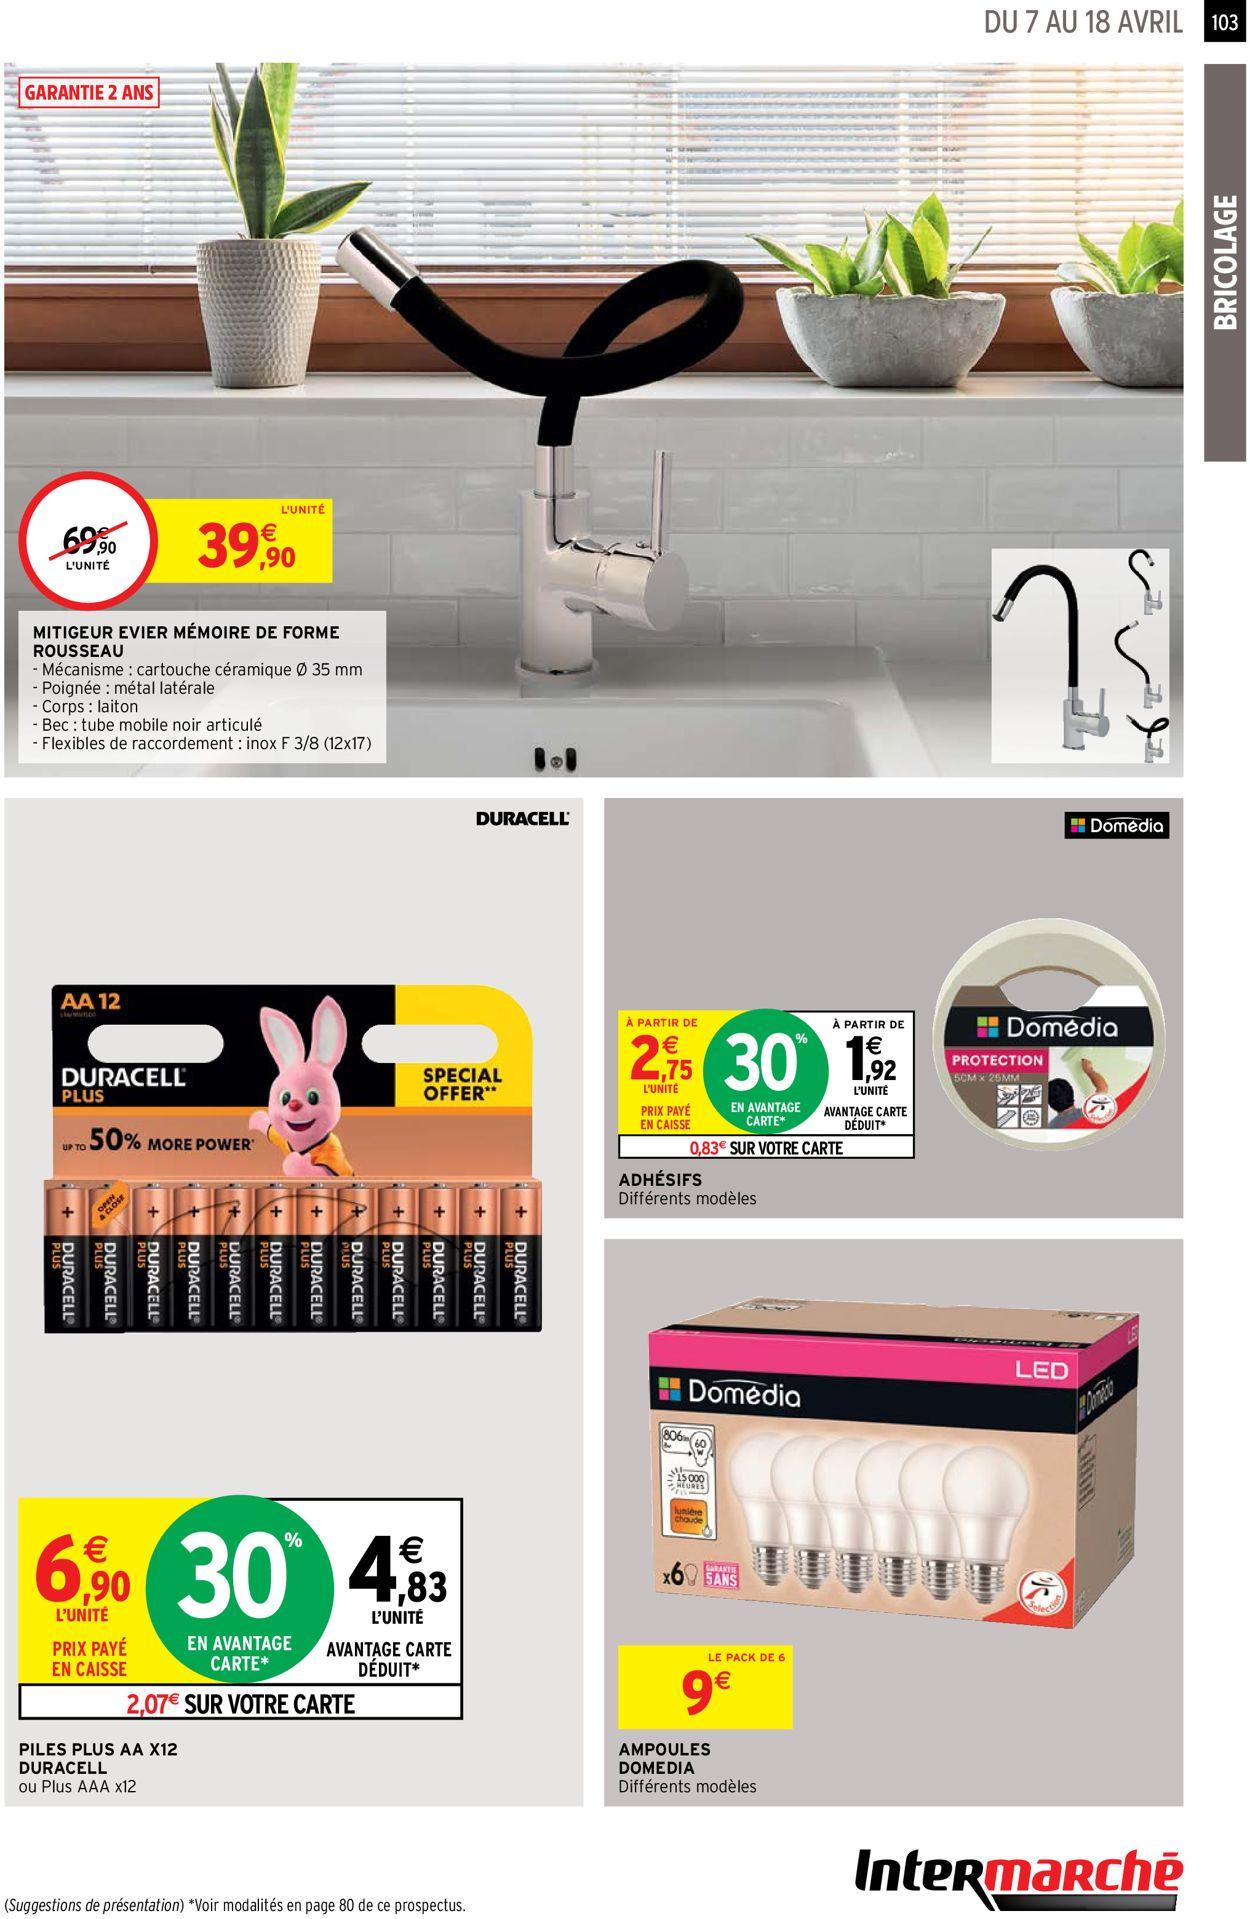 Intermarché Catalogue - 07.04-18.04.2021 (Page 103)